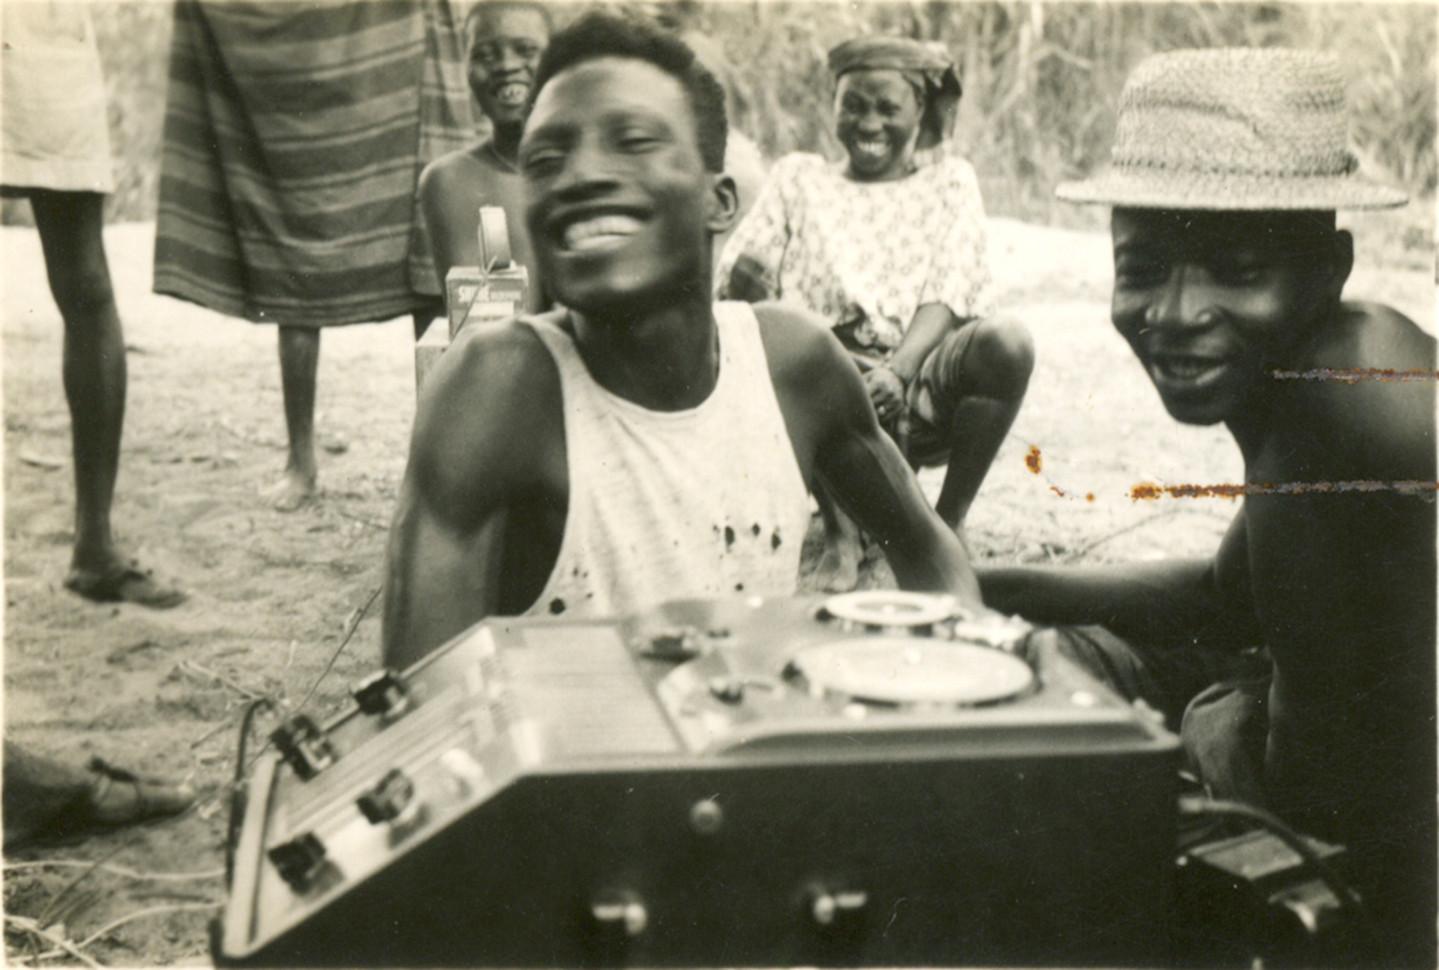 Two smiling informants, Nigeria